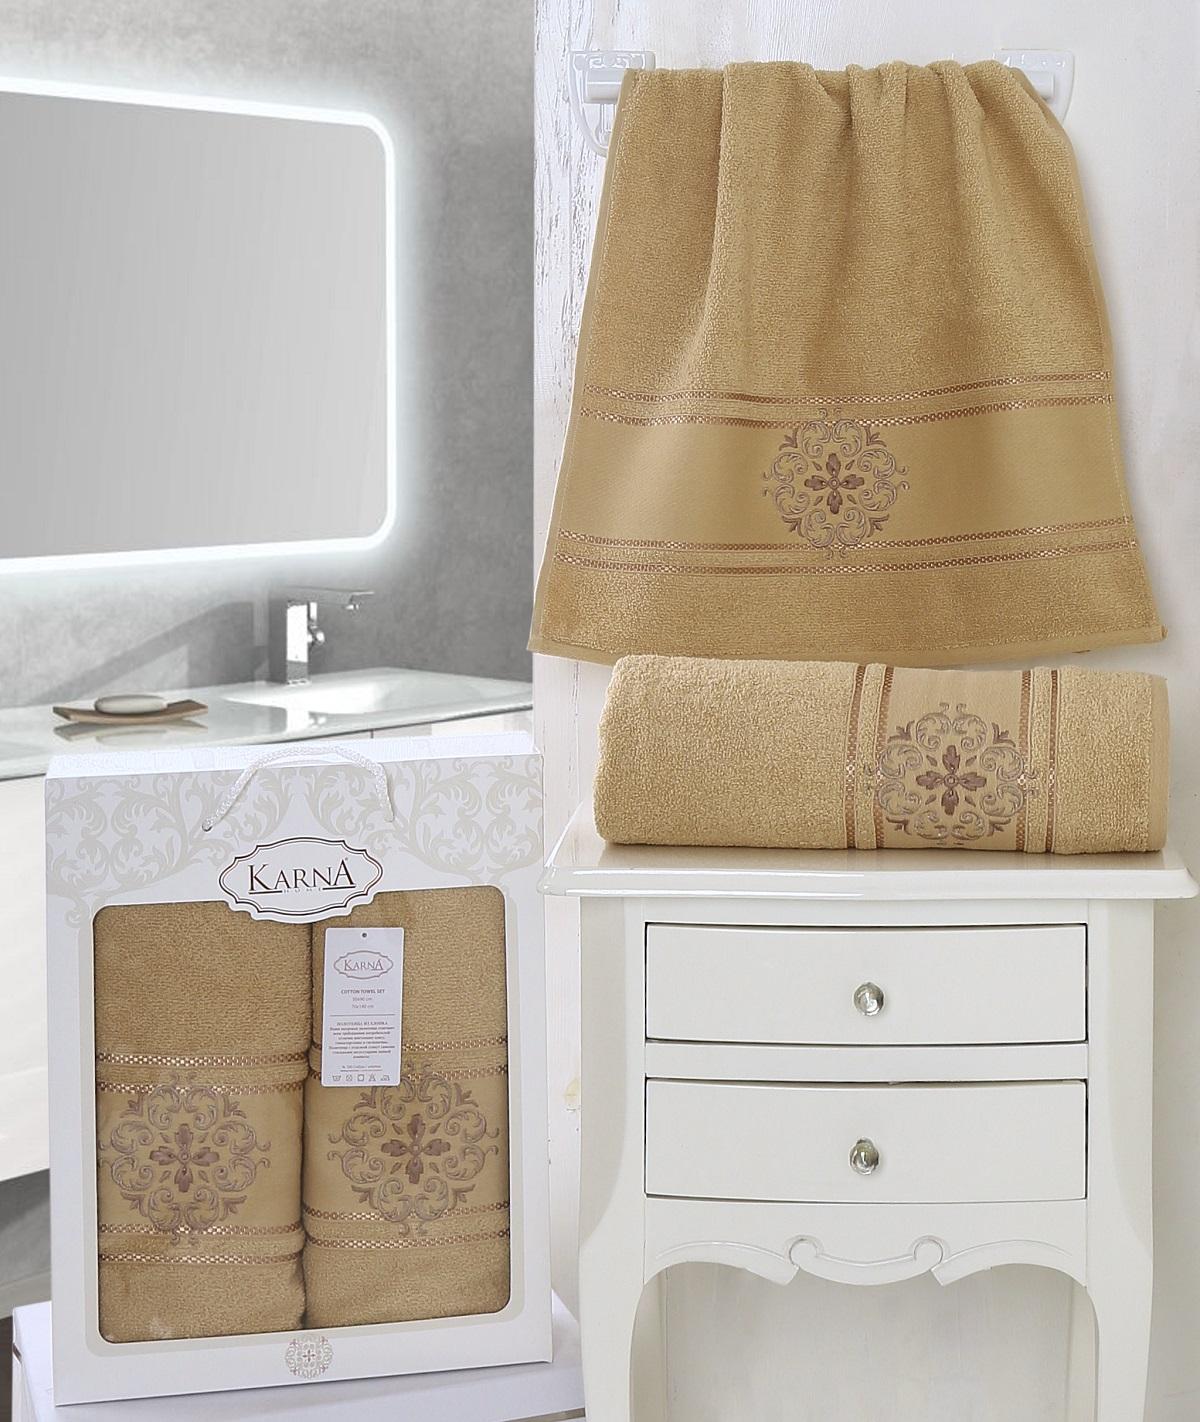 Полотенца Karna Полотенце Seher Цвет: Горчичный (Набор) every набор чехлов для дивана every цвет горчичный